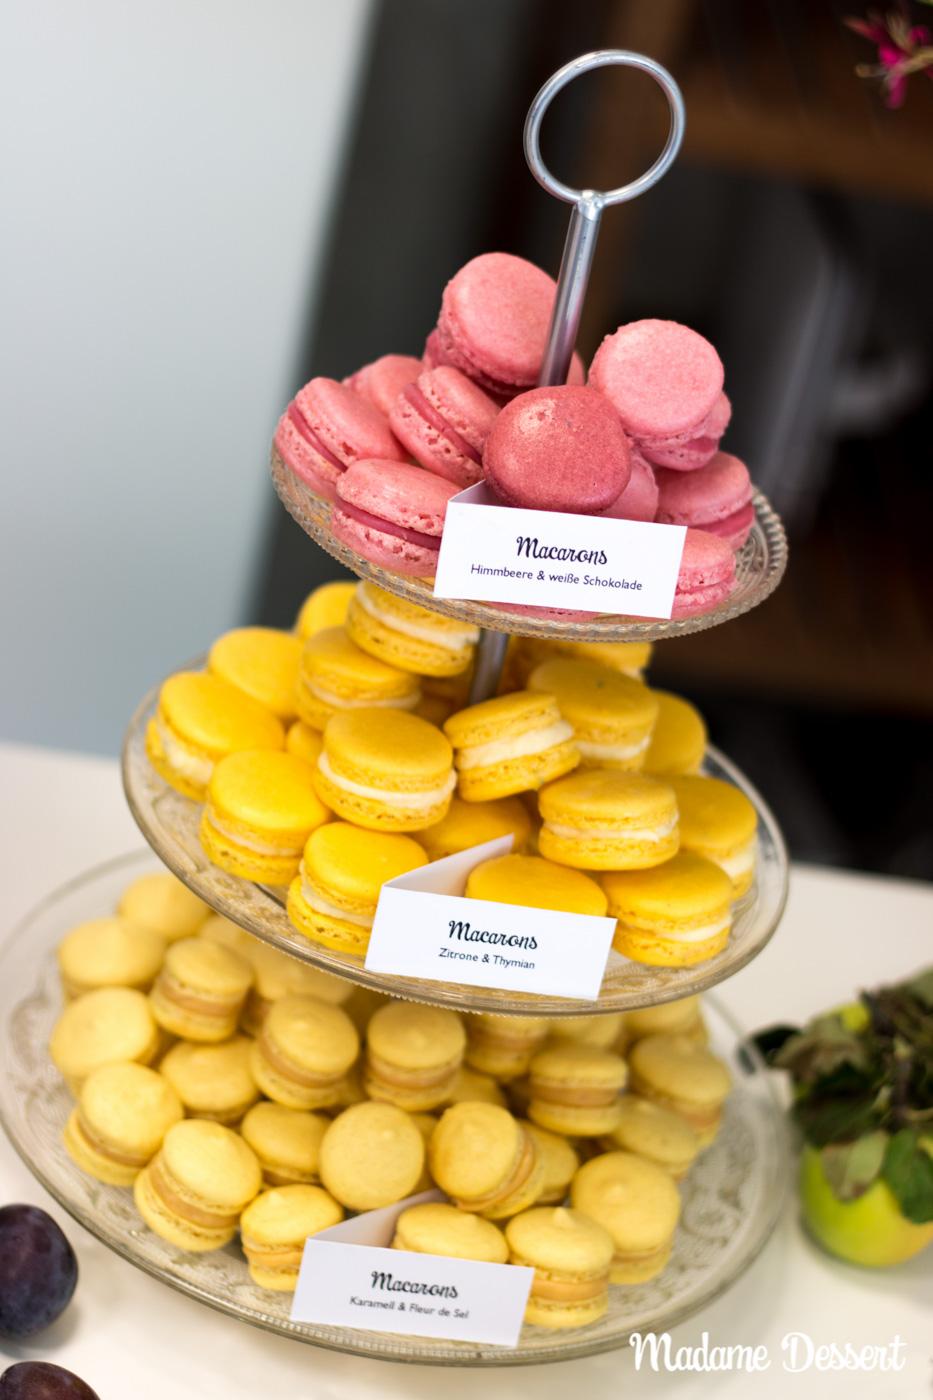 Macarons | Madame Dessert